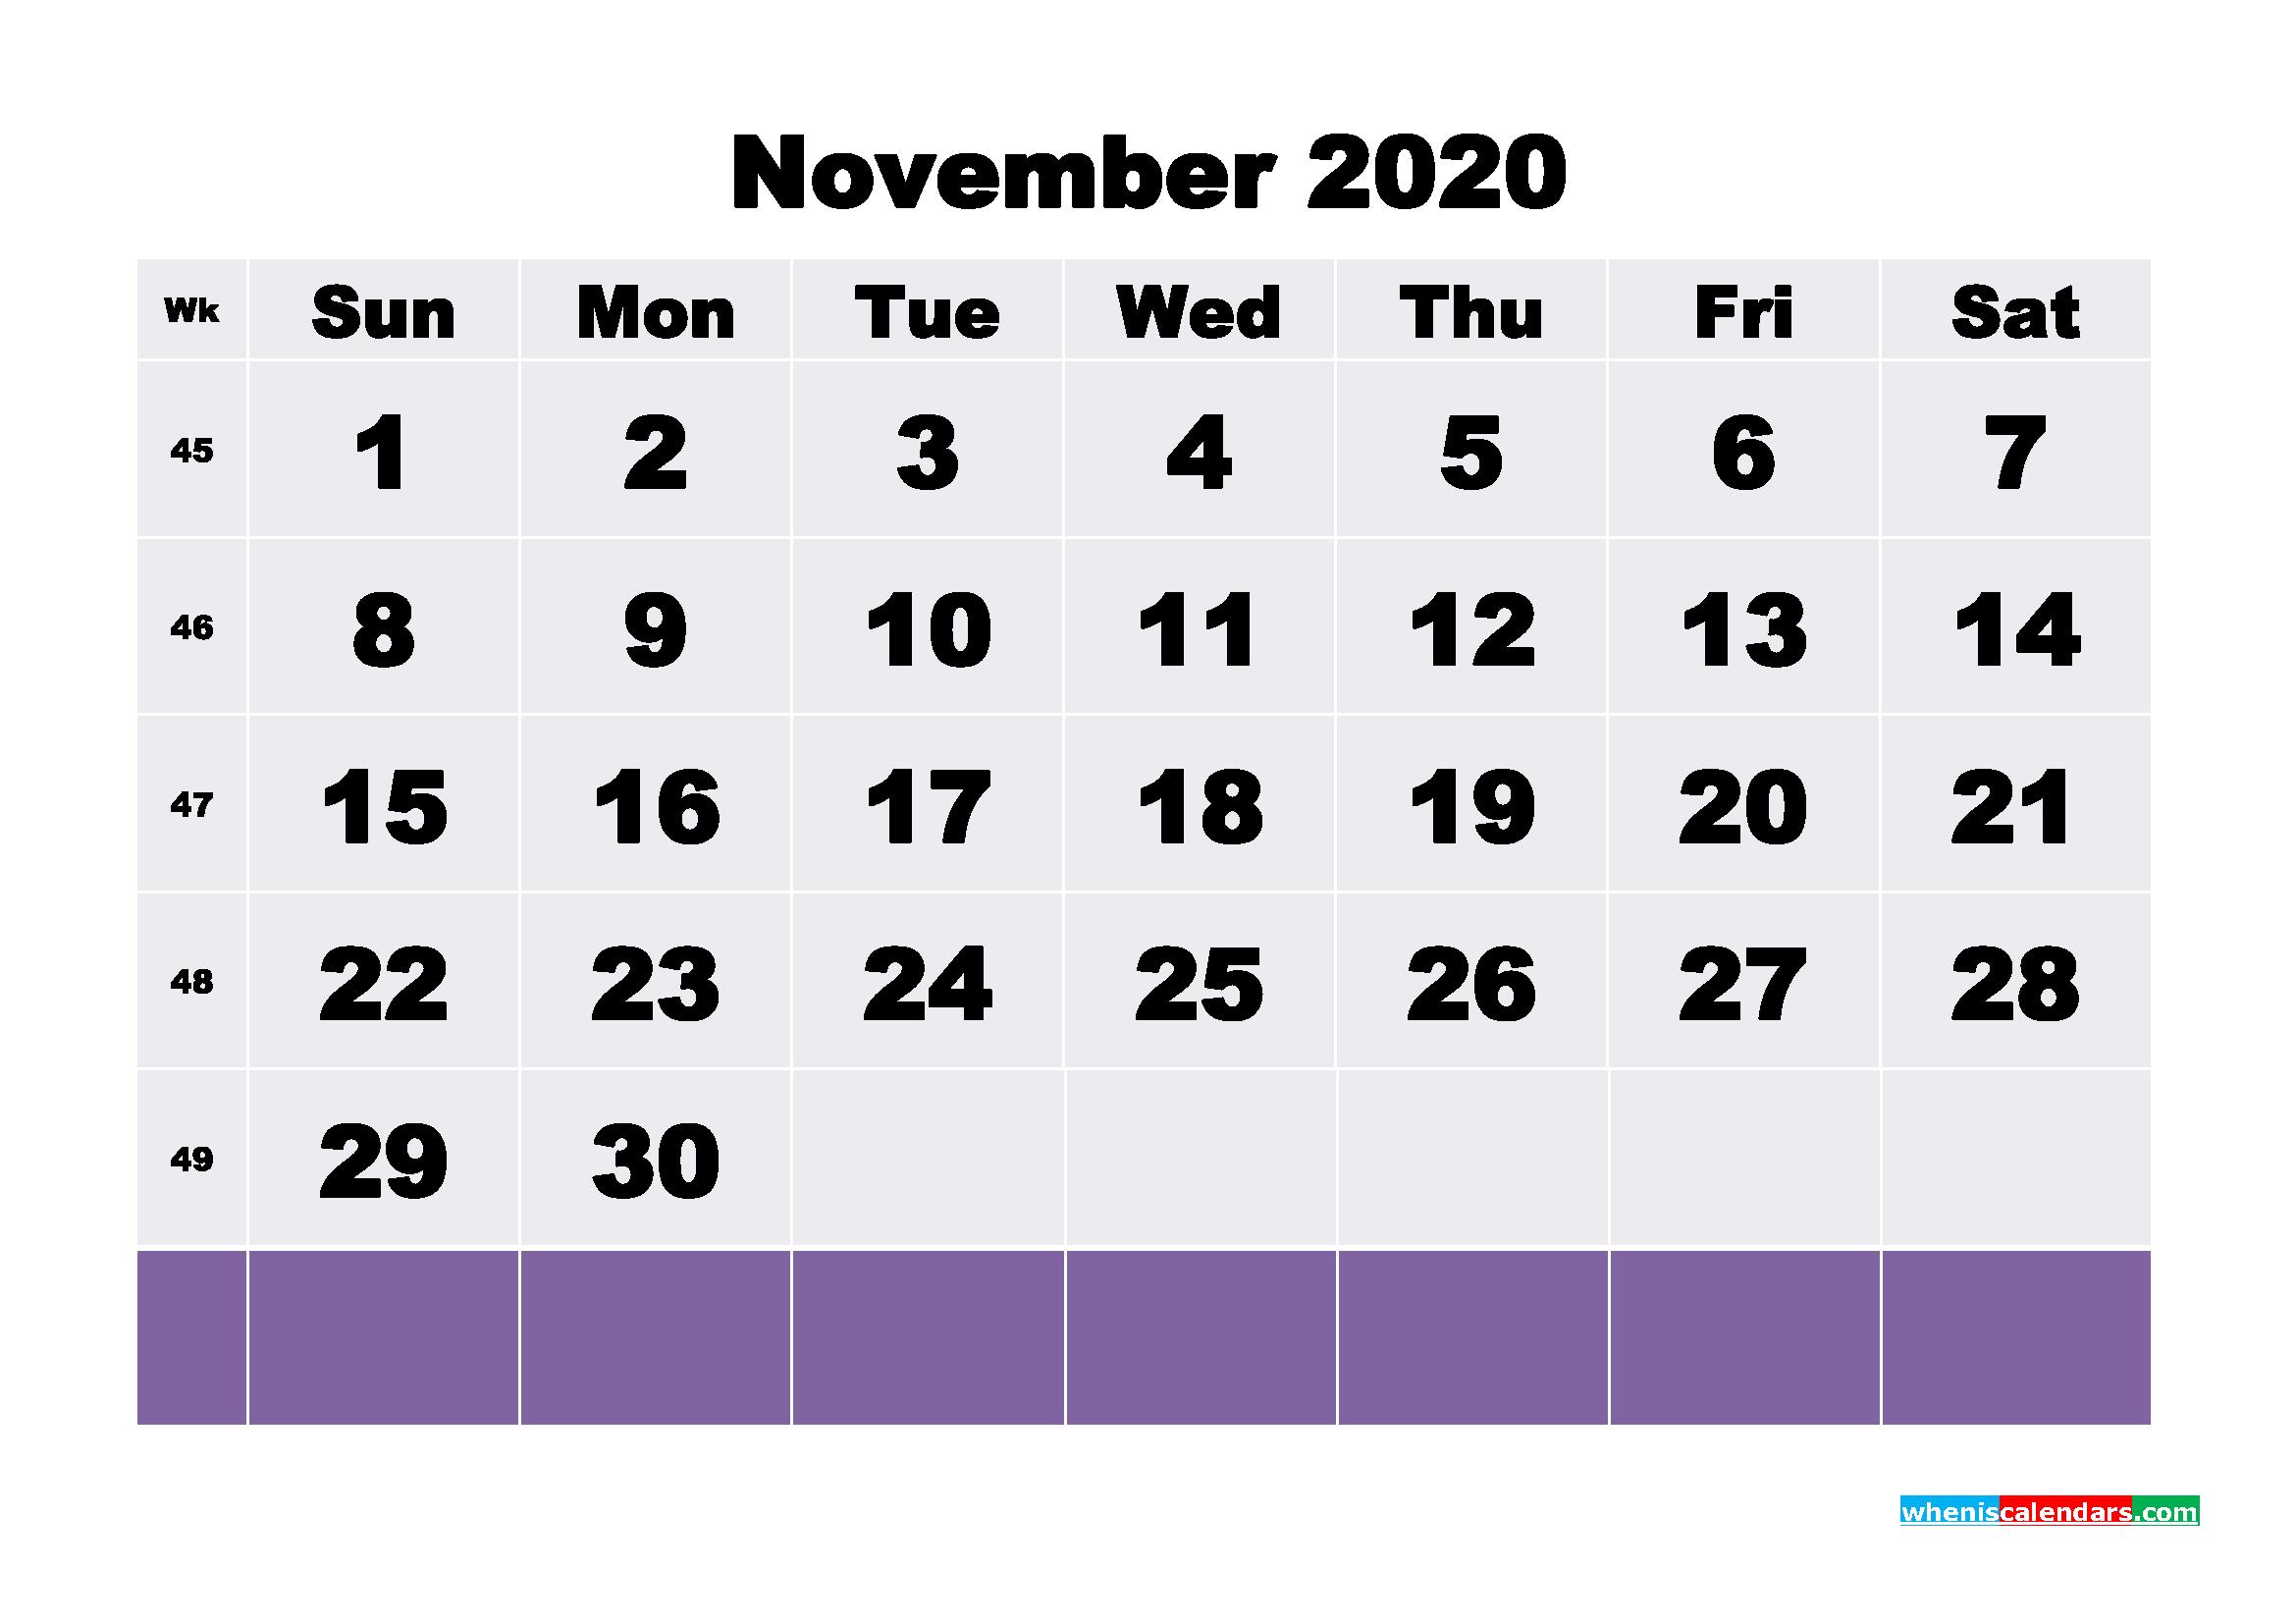 Blank November 2020 Calendar Printable - No.m20b131